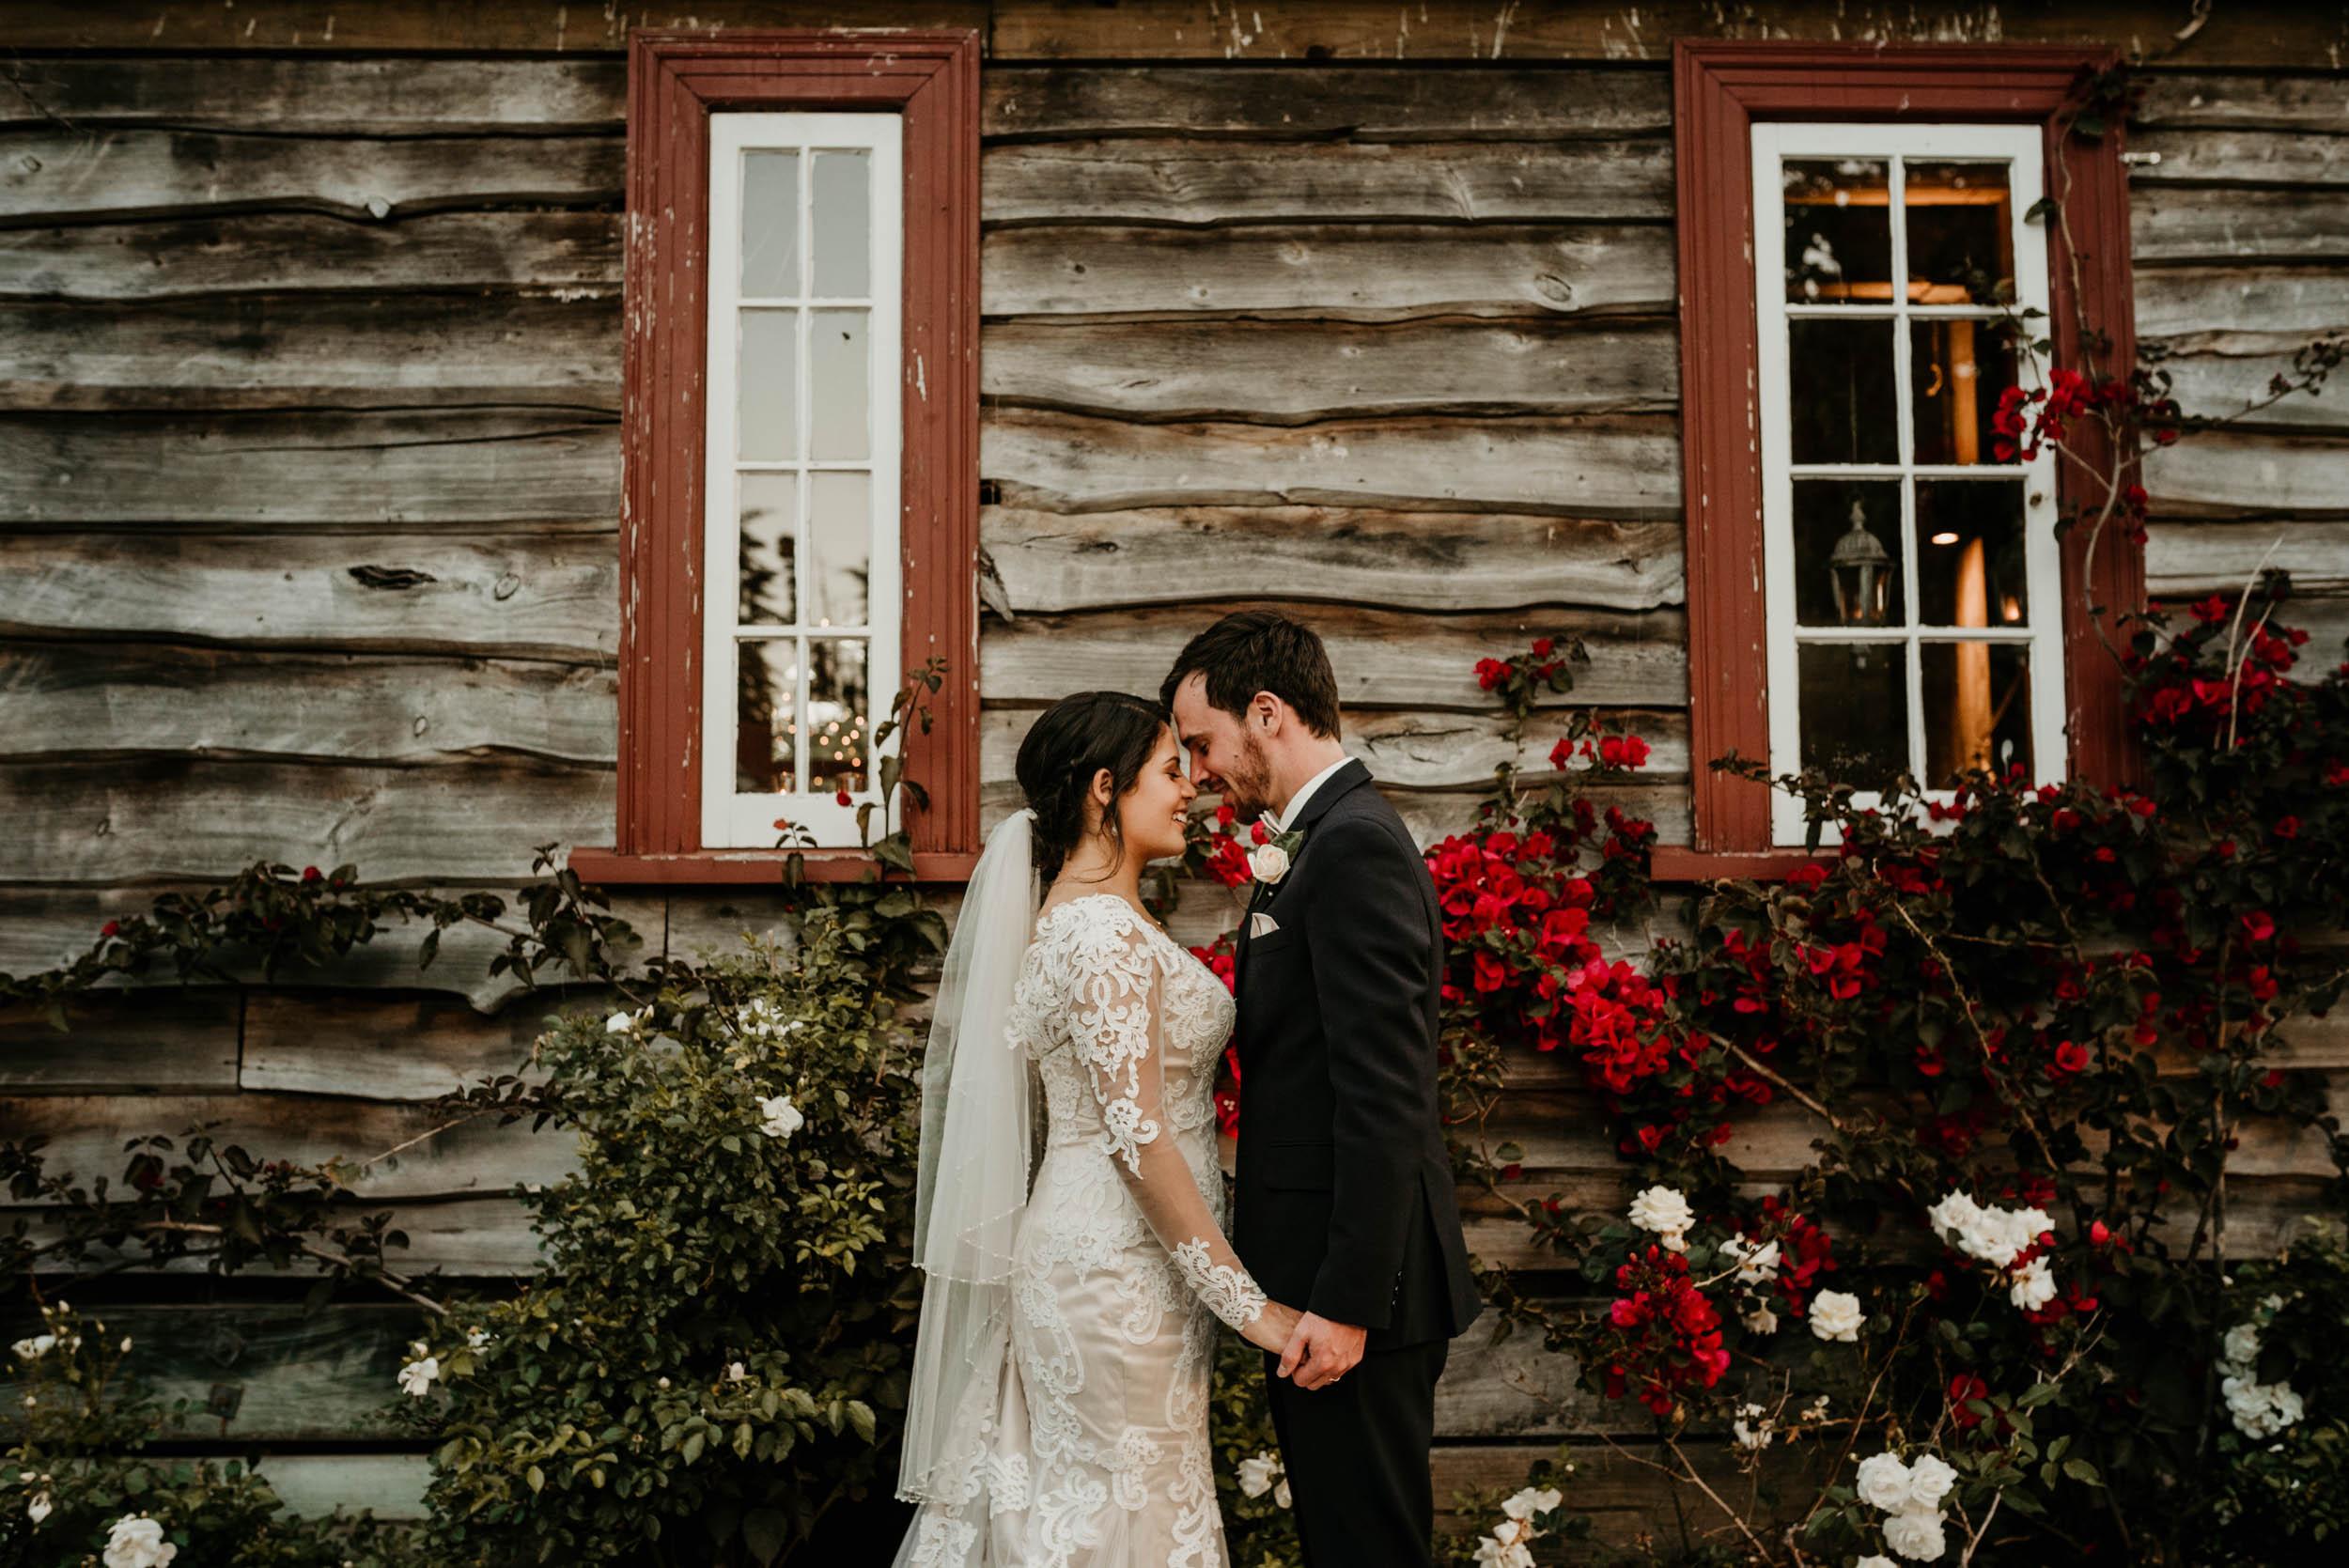 The Raw Photographer - Cairns Wedding Photographer - New Zealand Destination Photography - Travel - Australian-19.jpg